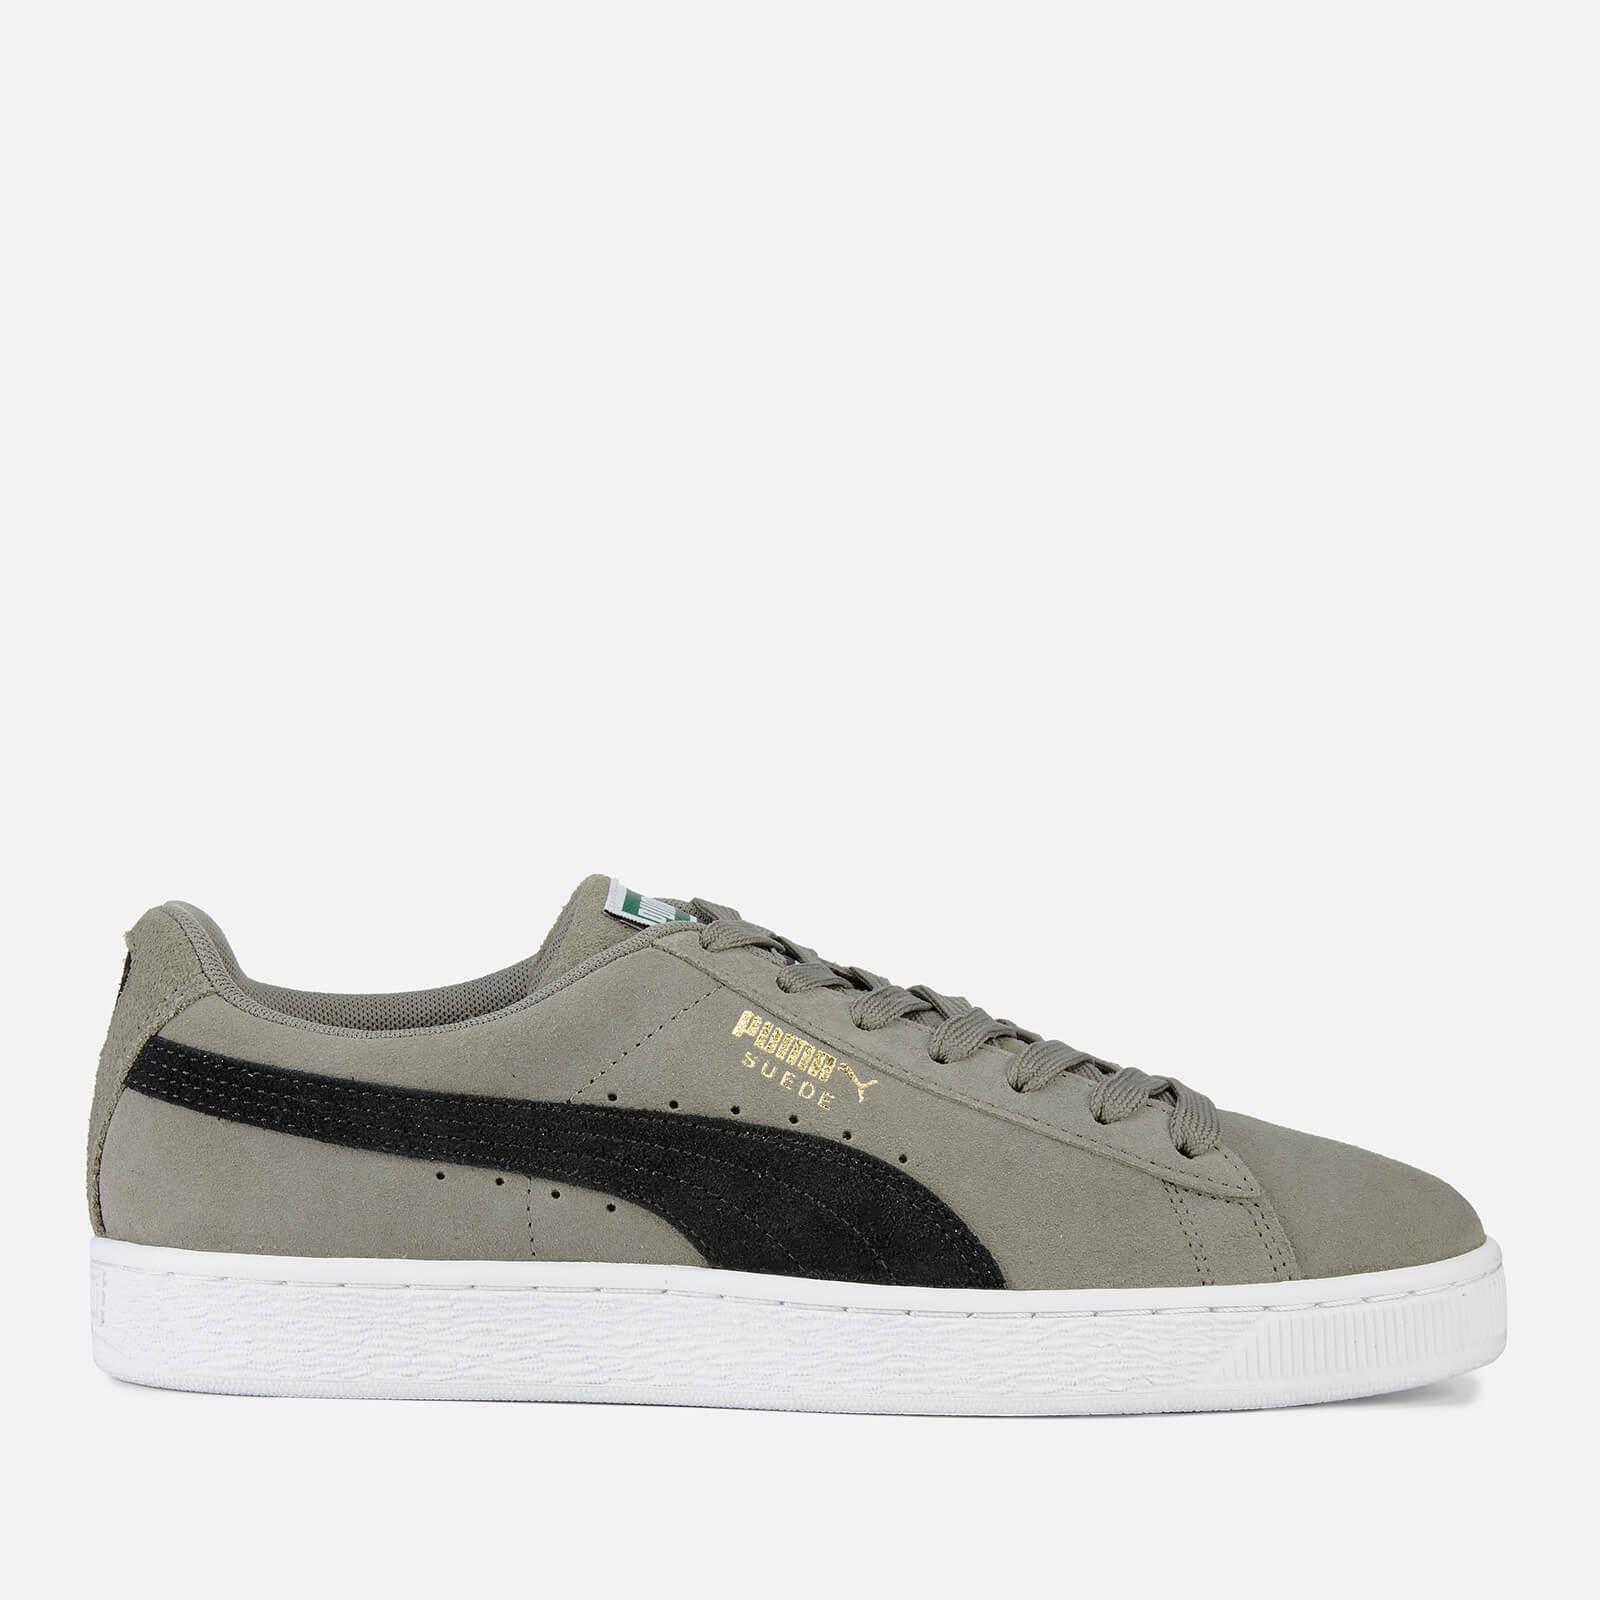 6da682385bd1bc Puma Men s Suede Classic Trainers - Charcoal Grey Puma Black